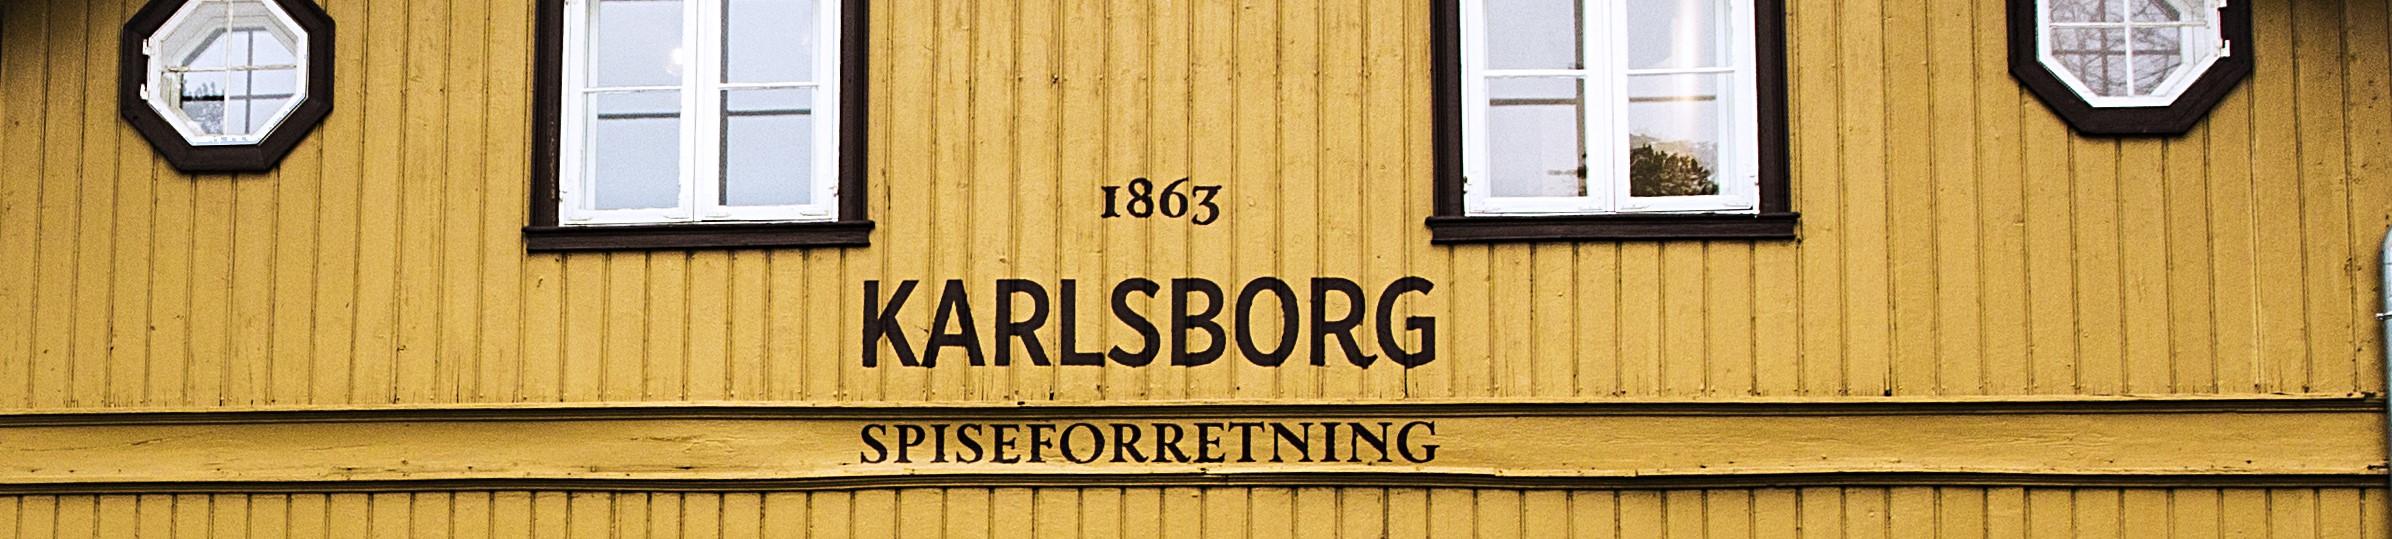 karlsborg-9313-1